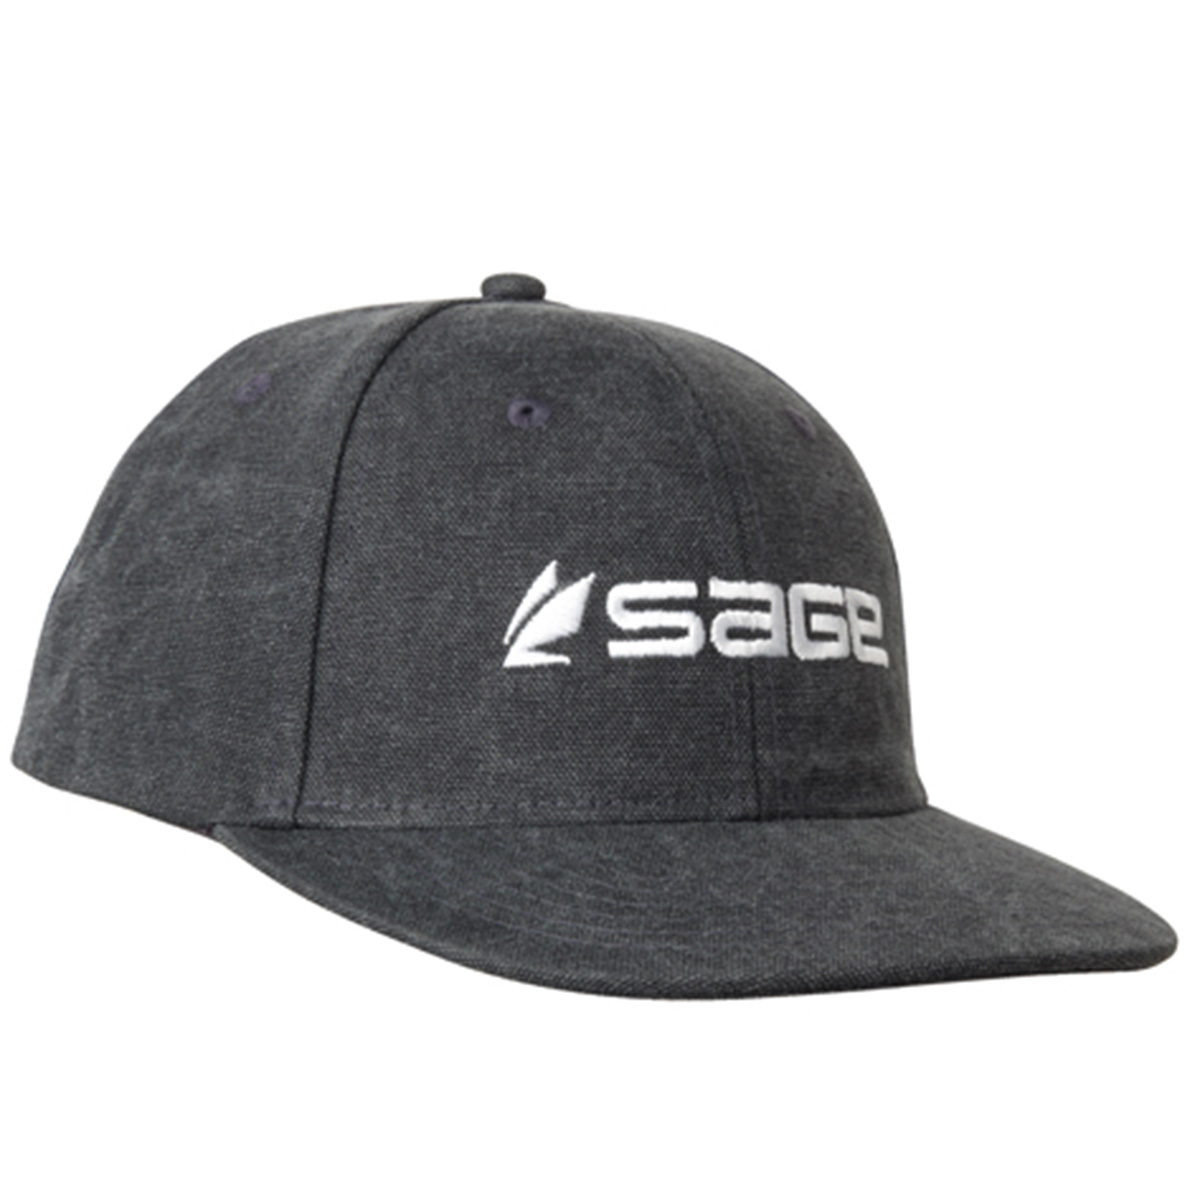 Sage drift hat fishing caps taimen for Sage fly fishing hat